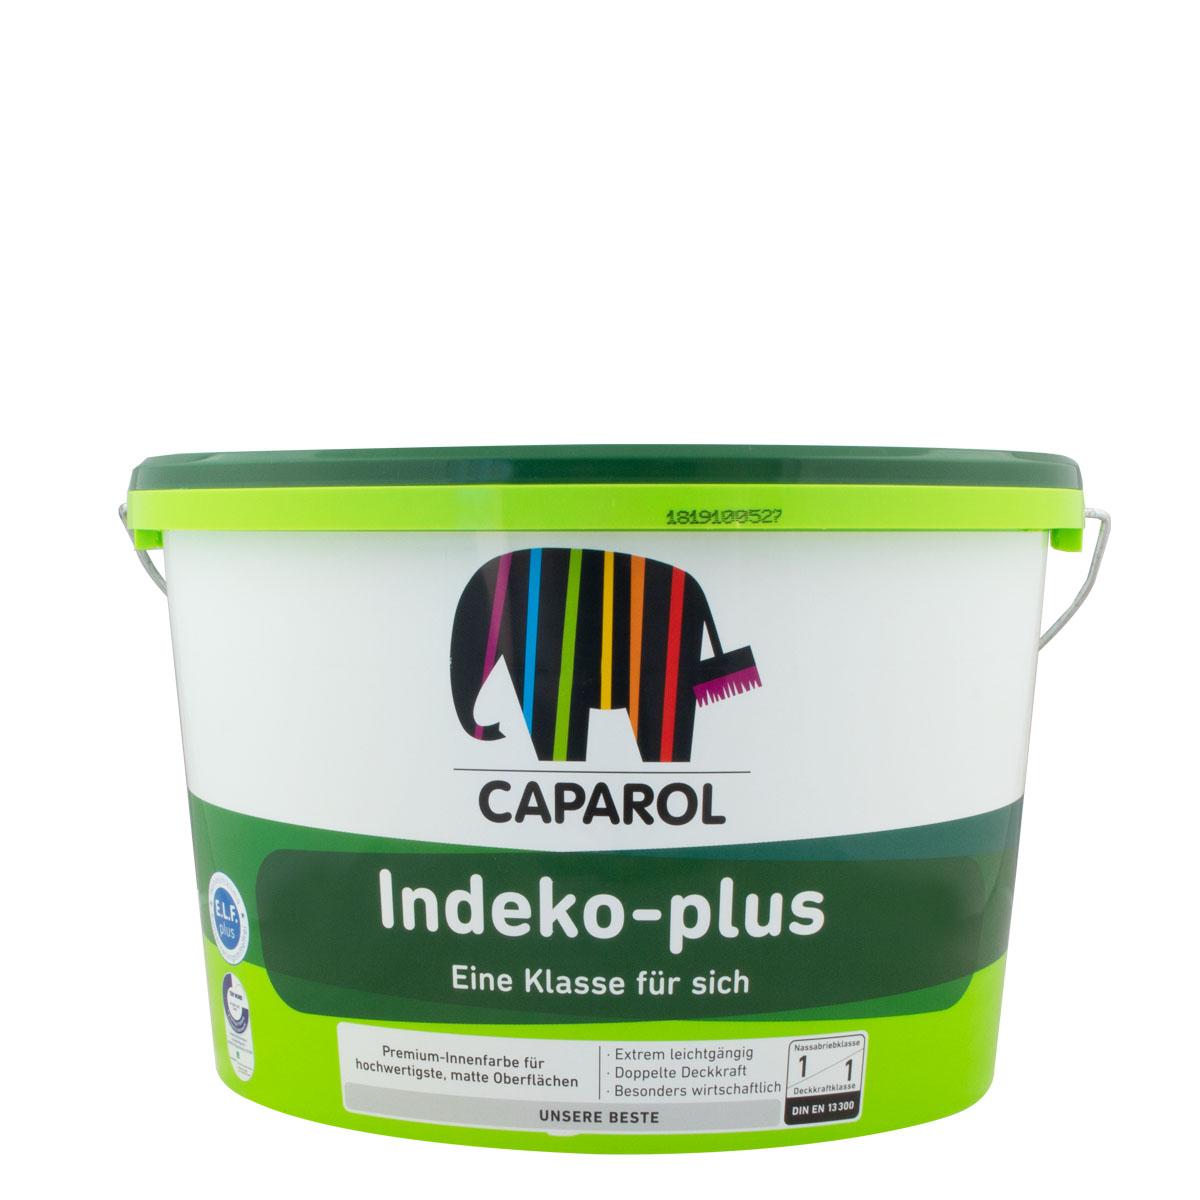 Caparol Indeko Plus 12,5L MIX PG S, HBW 70-100, premium Innenfarbe, hochdeckend